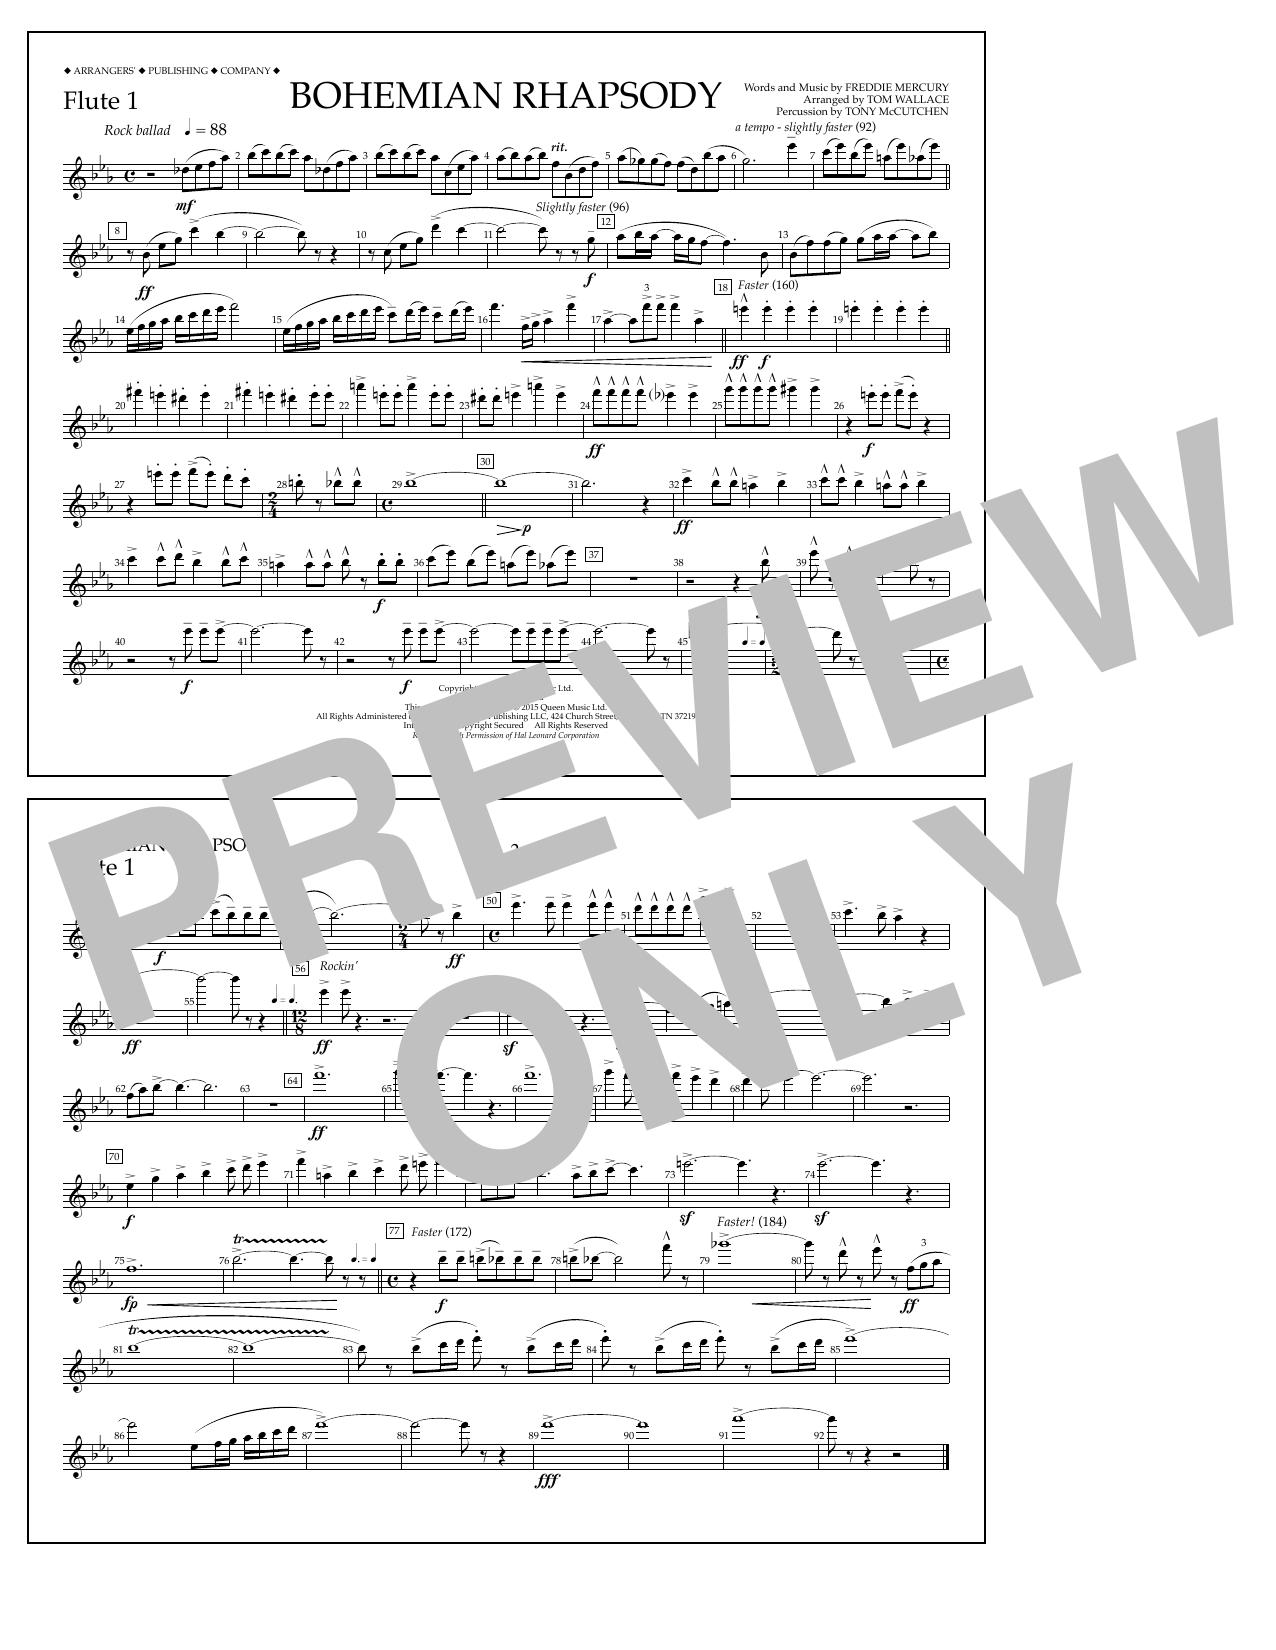 Bohemian Rhapsody - Flute 1 (Marching Band)